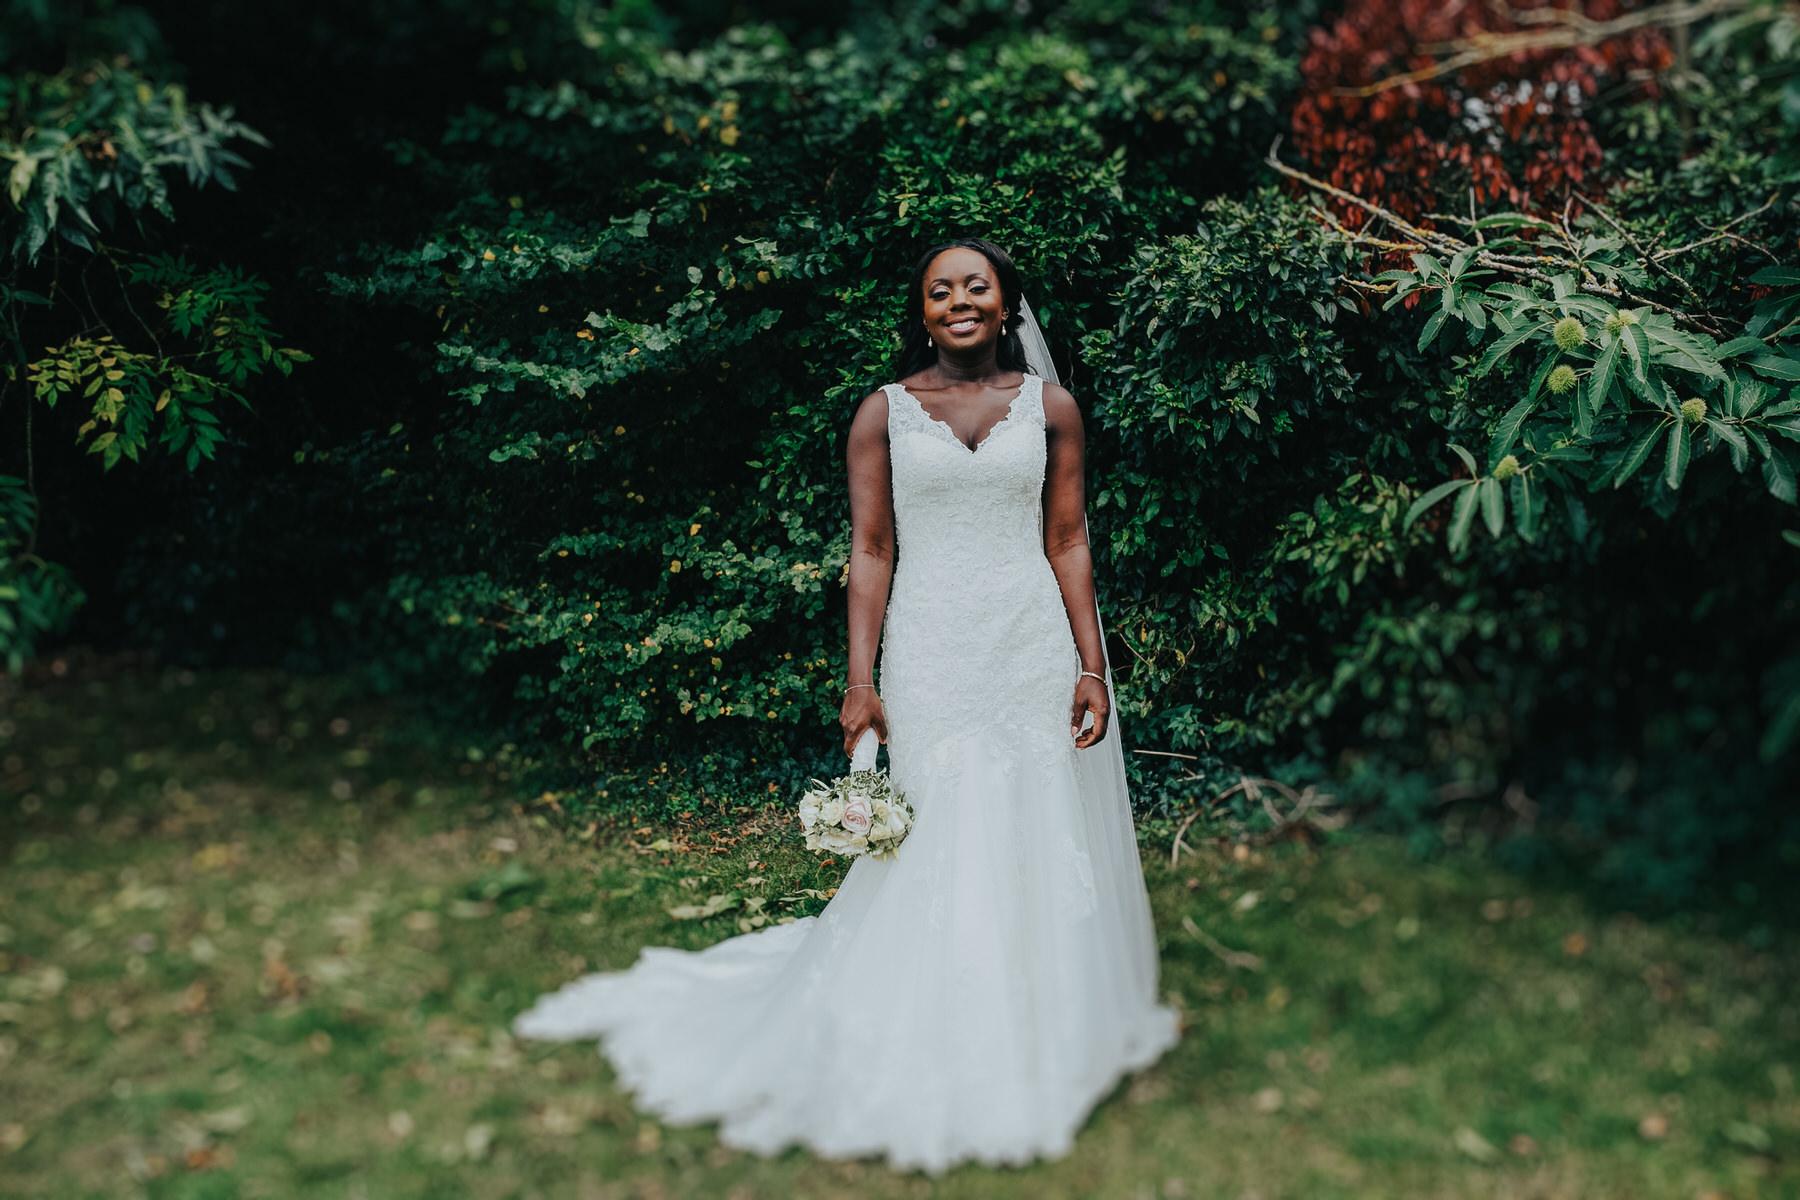 196-Belair House Dulwich groom bride wedding portraits.jpg